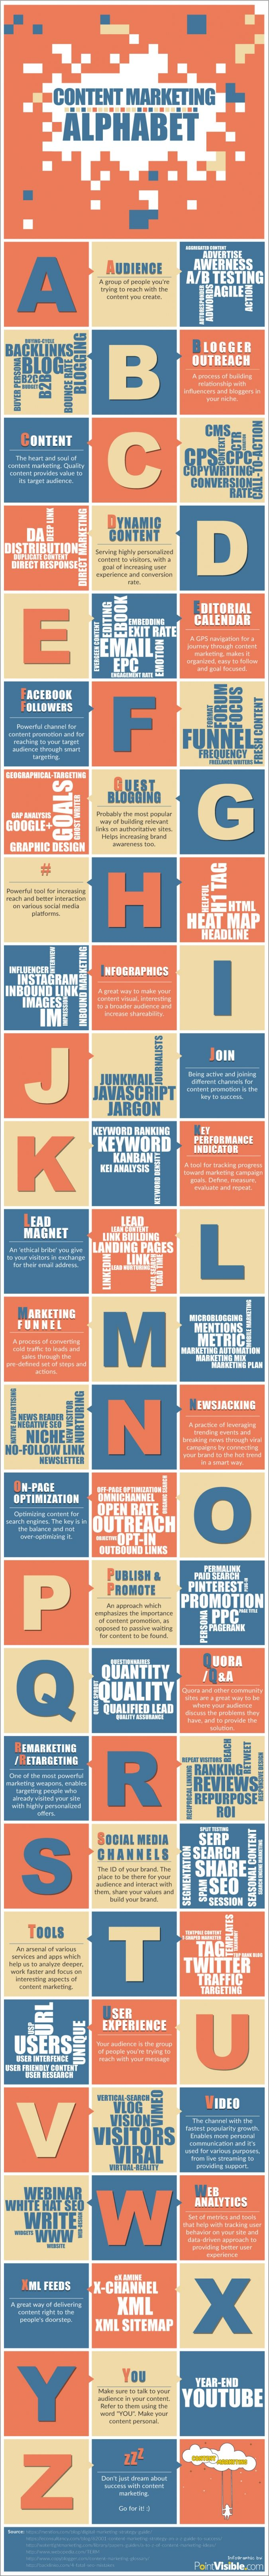 #SMM #SocialMedia #ContentMarketing #Infografik #ContentStrategie